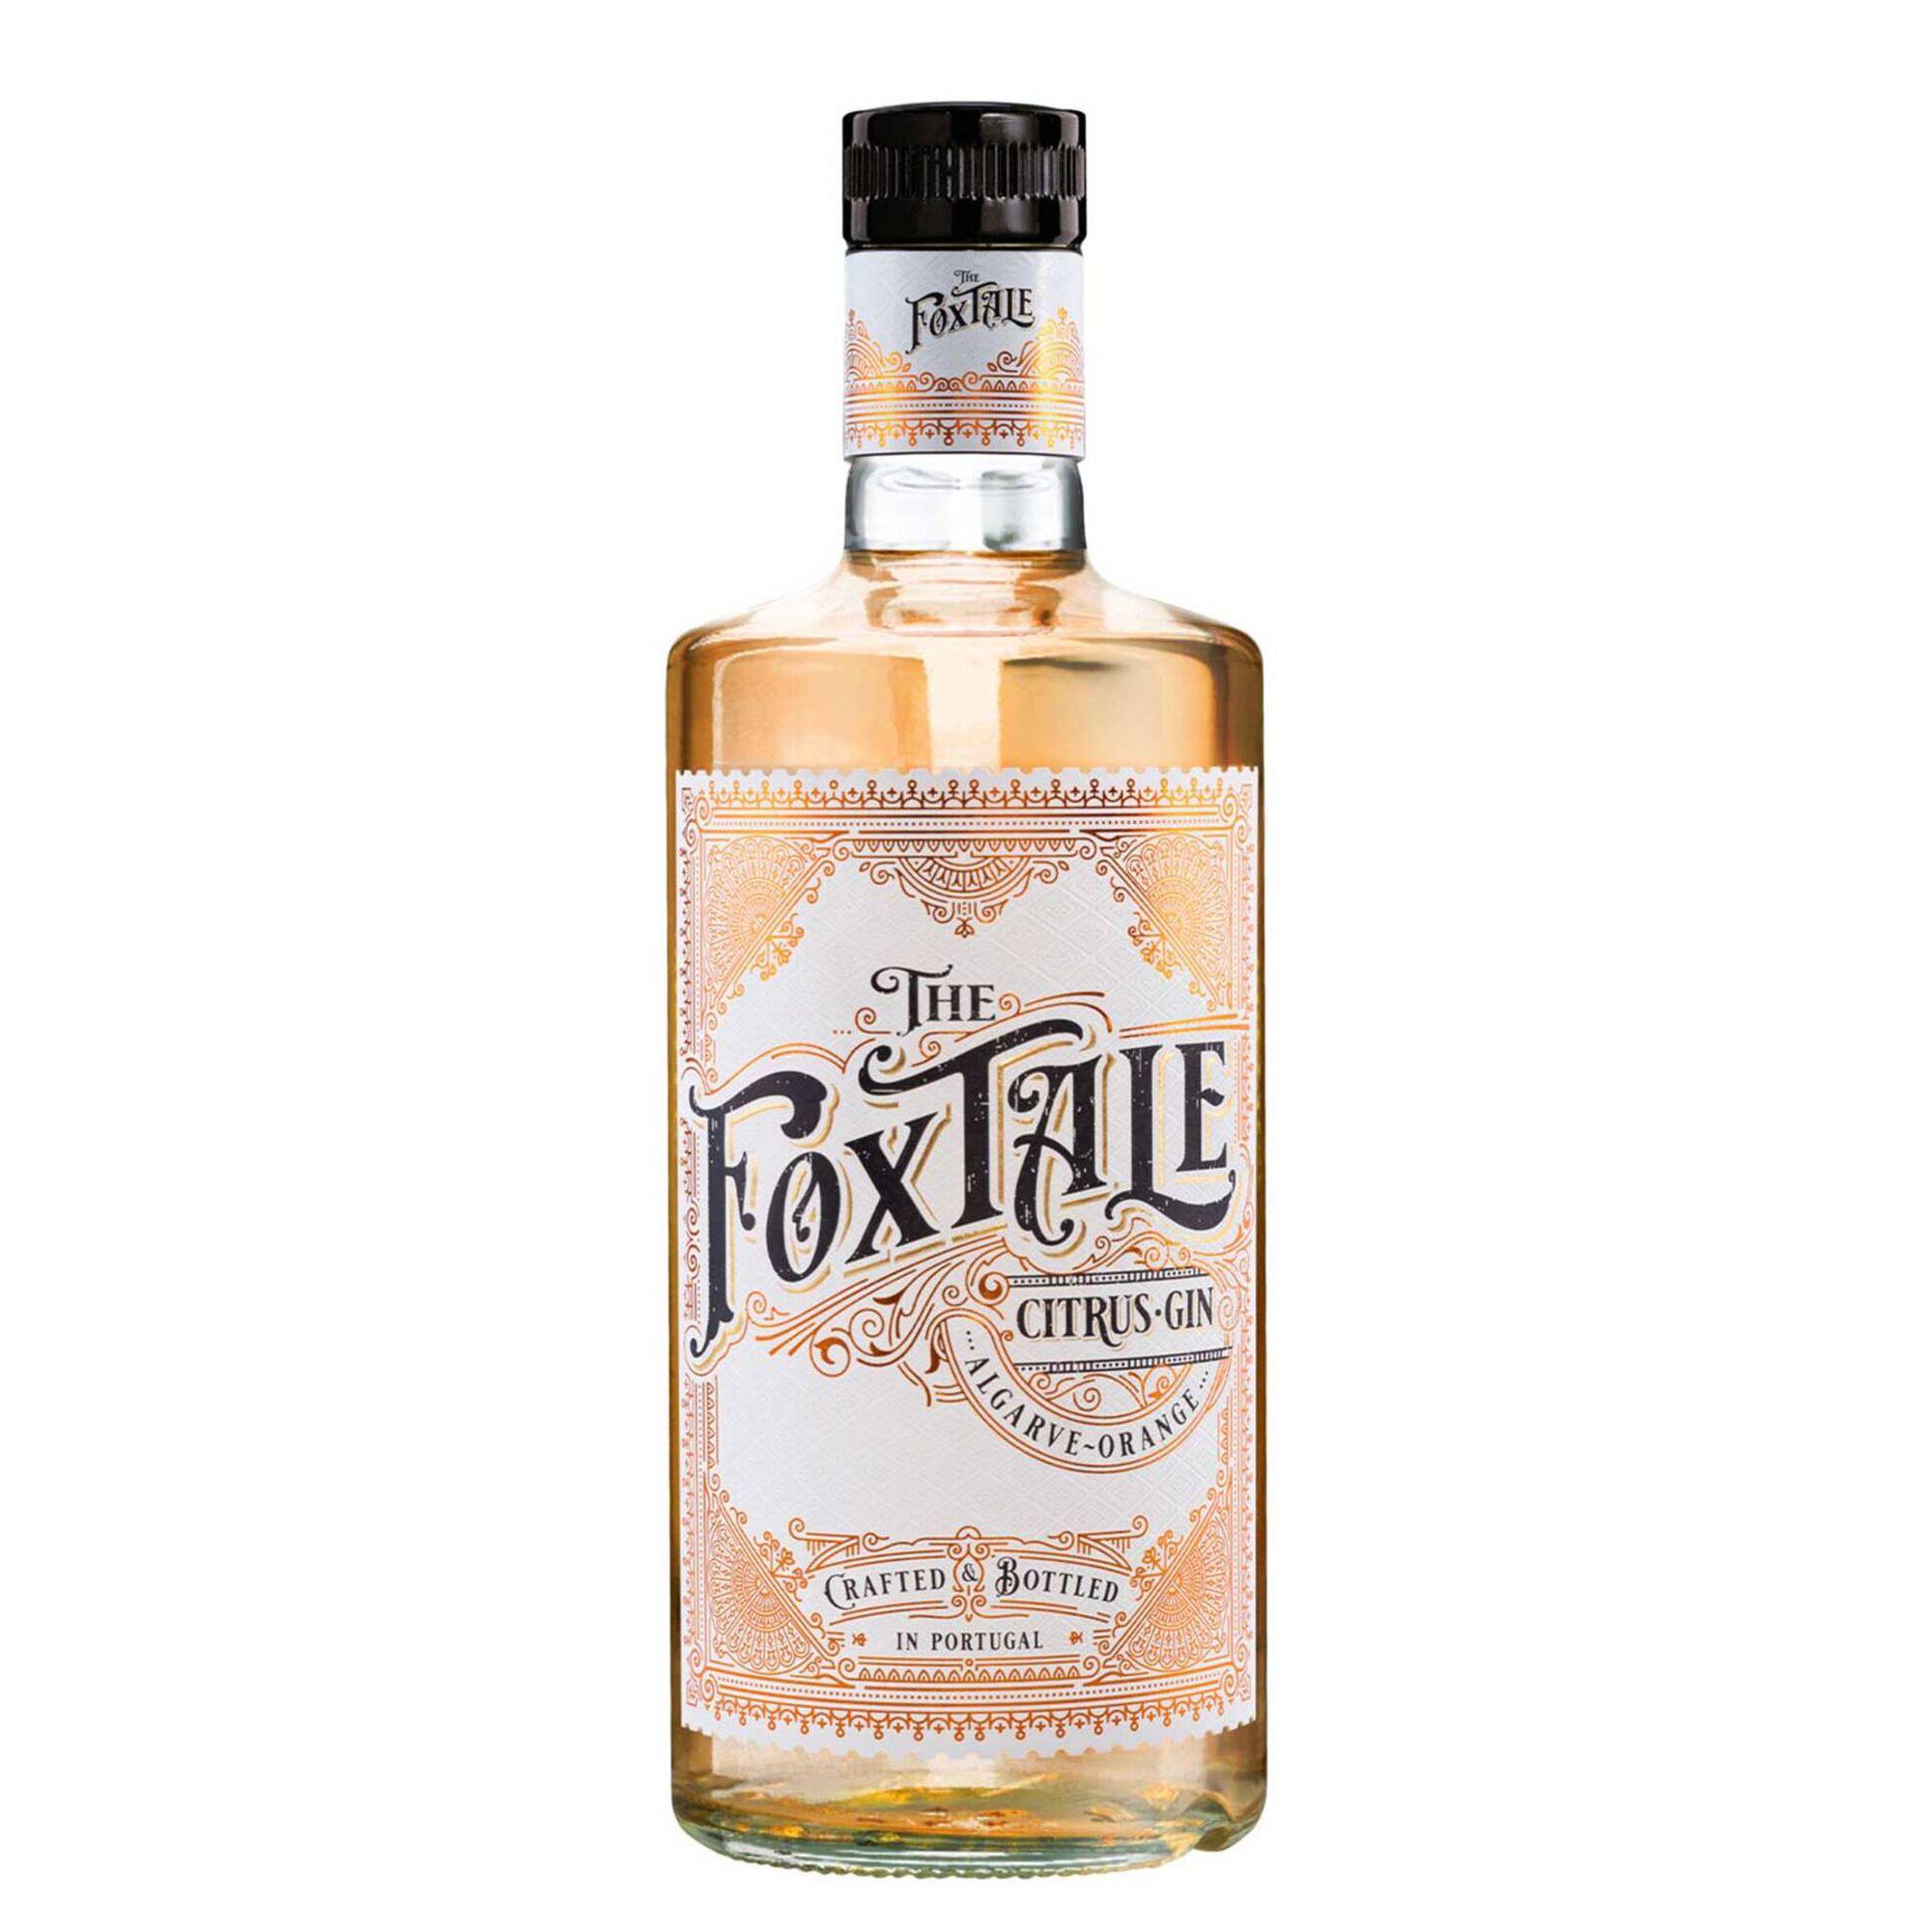 Gin The Foxtale Citrus